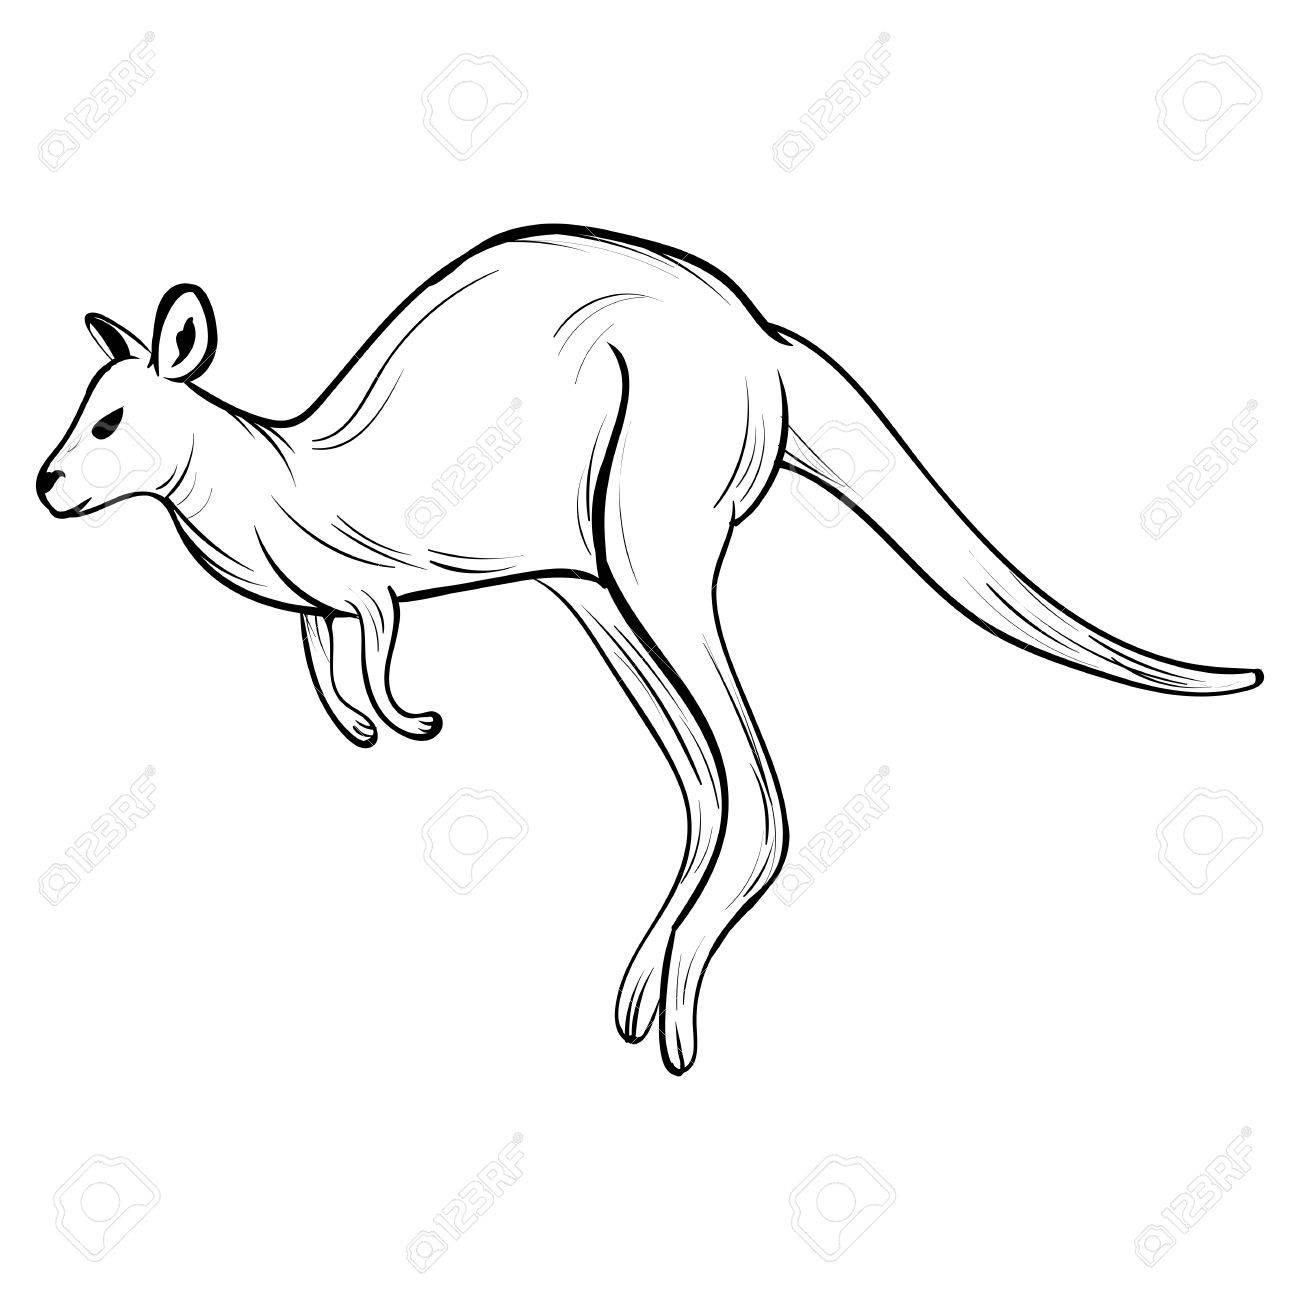 Hand draw kangaroo style sketch tattoo on white background stock vector 84740518